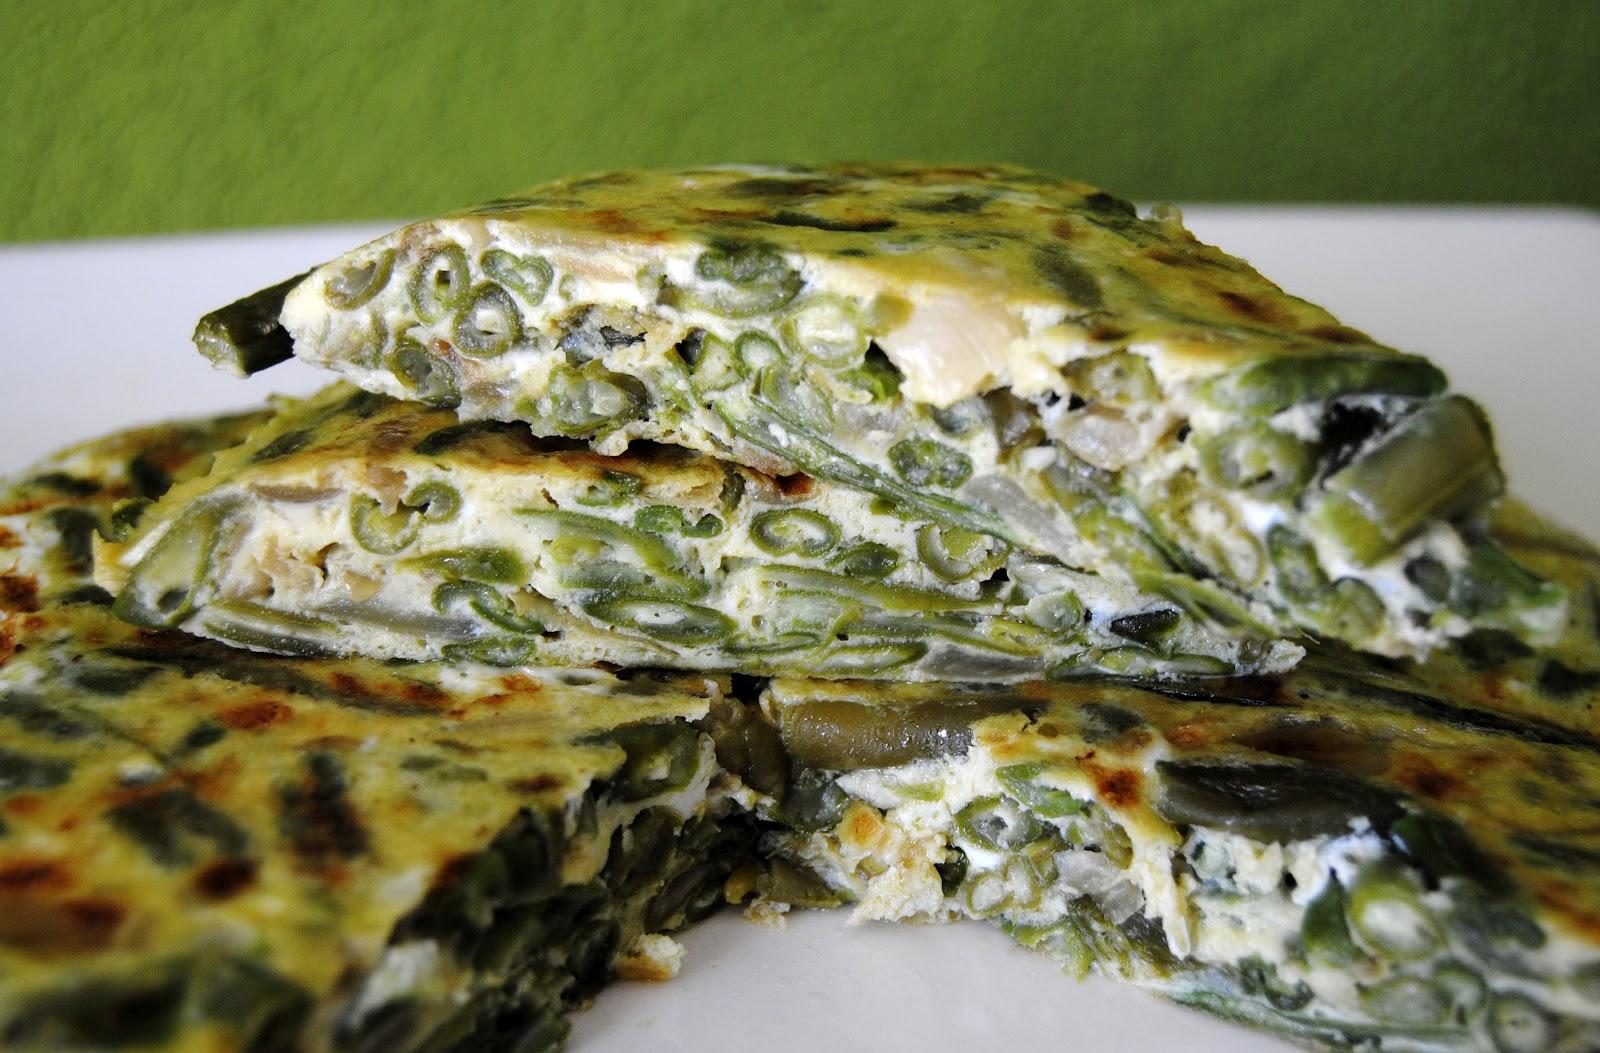 Tortilla de jud as verdes receta asopaipas recetas de - Calorias de las judias verdes ...